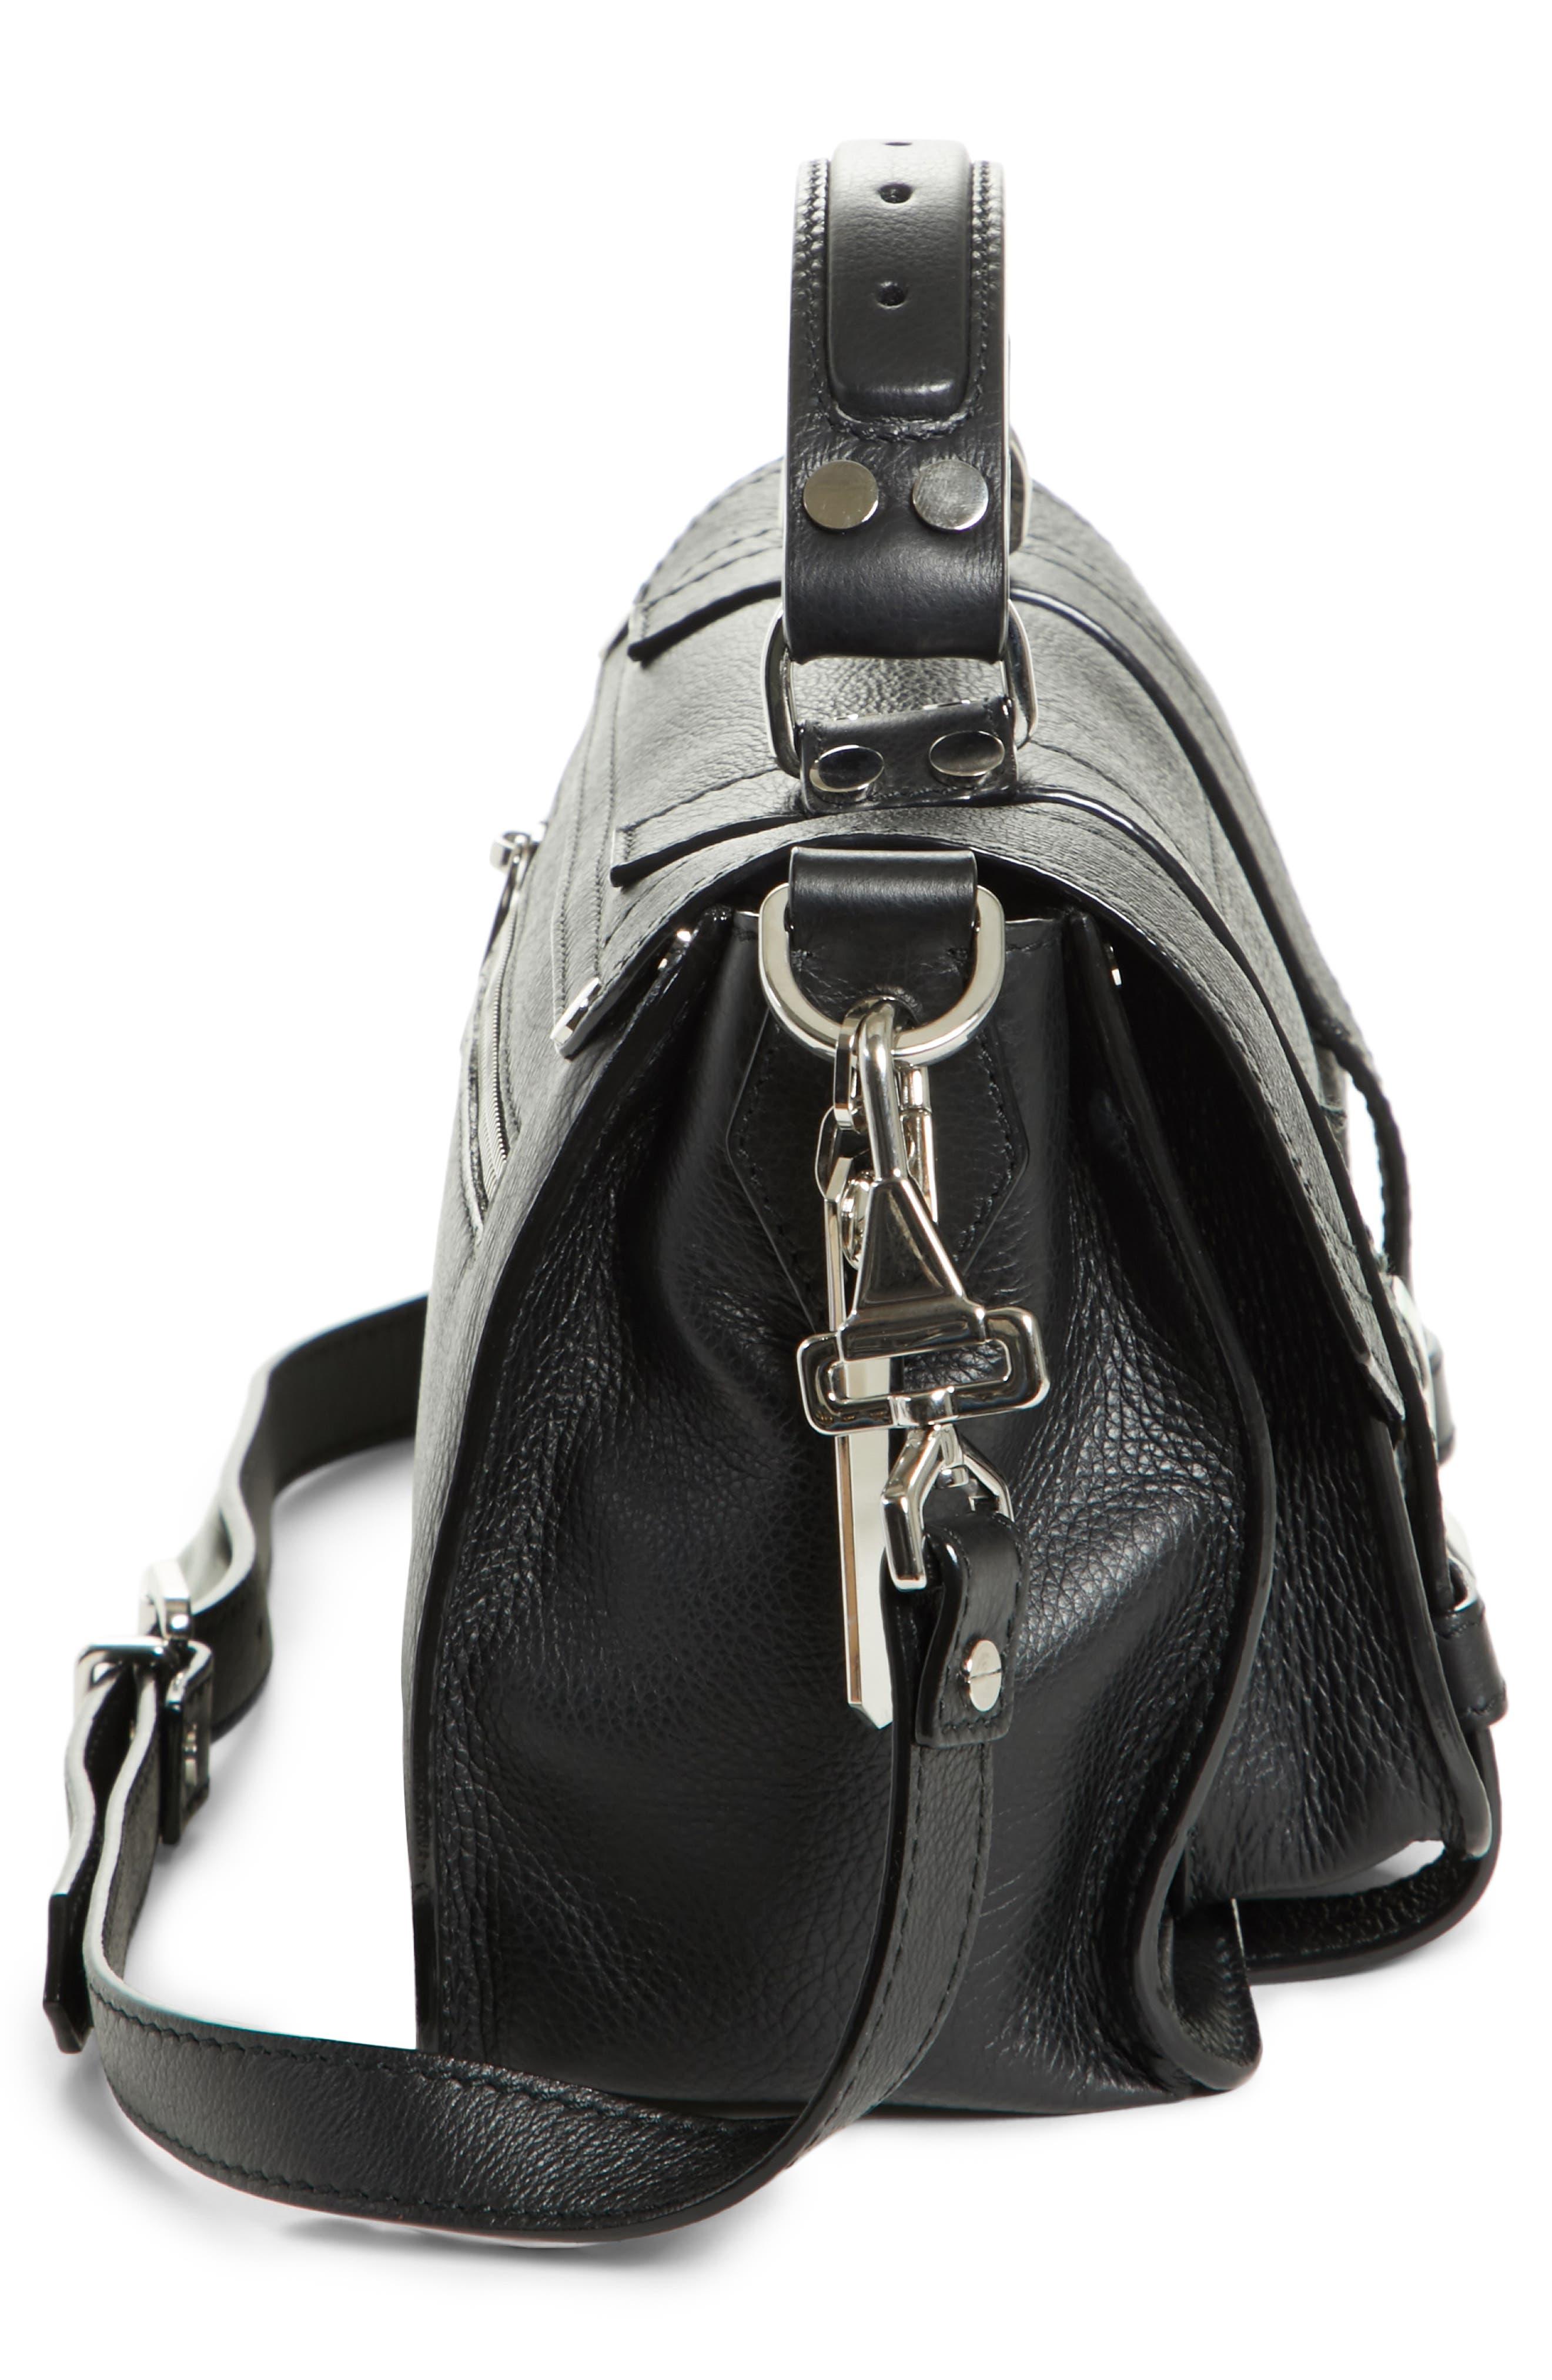 Tiny PS1 Grainy Leather Satchel,                             Alternate thumbnail 4, color,                             BLACK